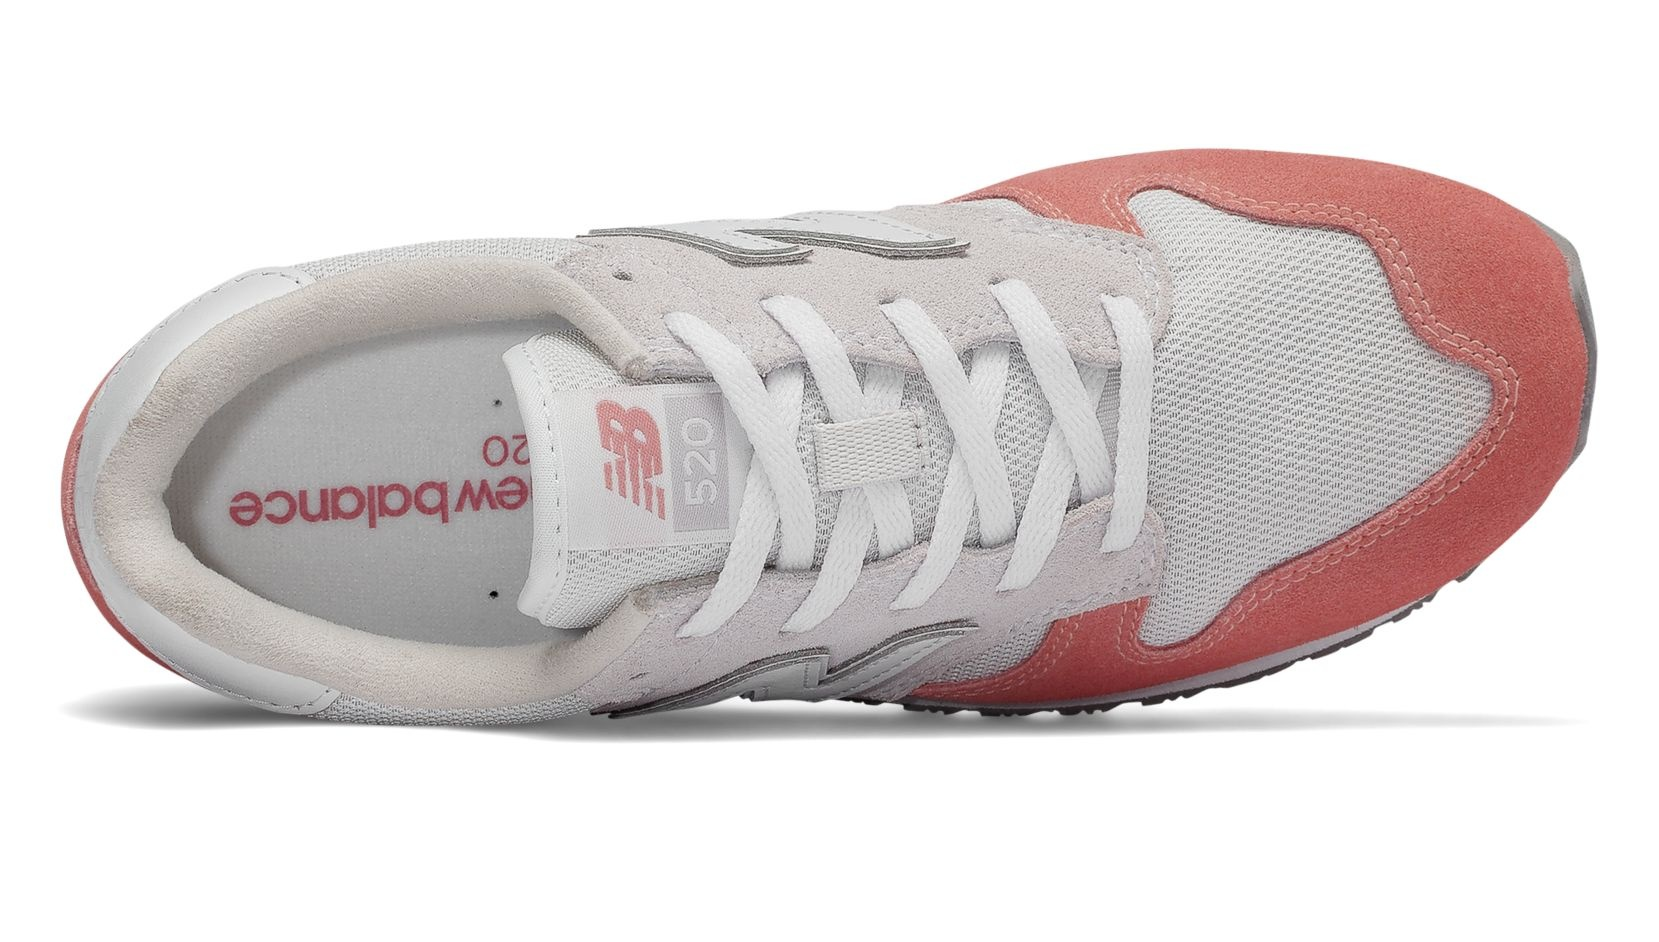 newest 391b0 cd138 ... New Balance sneakers WL 520 TD ladies pink   gray ...